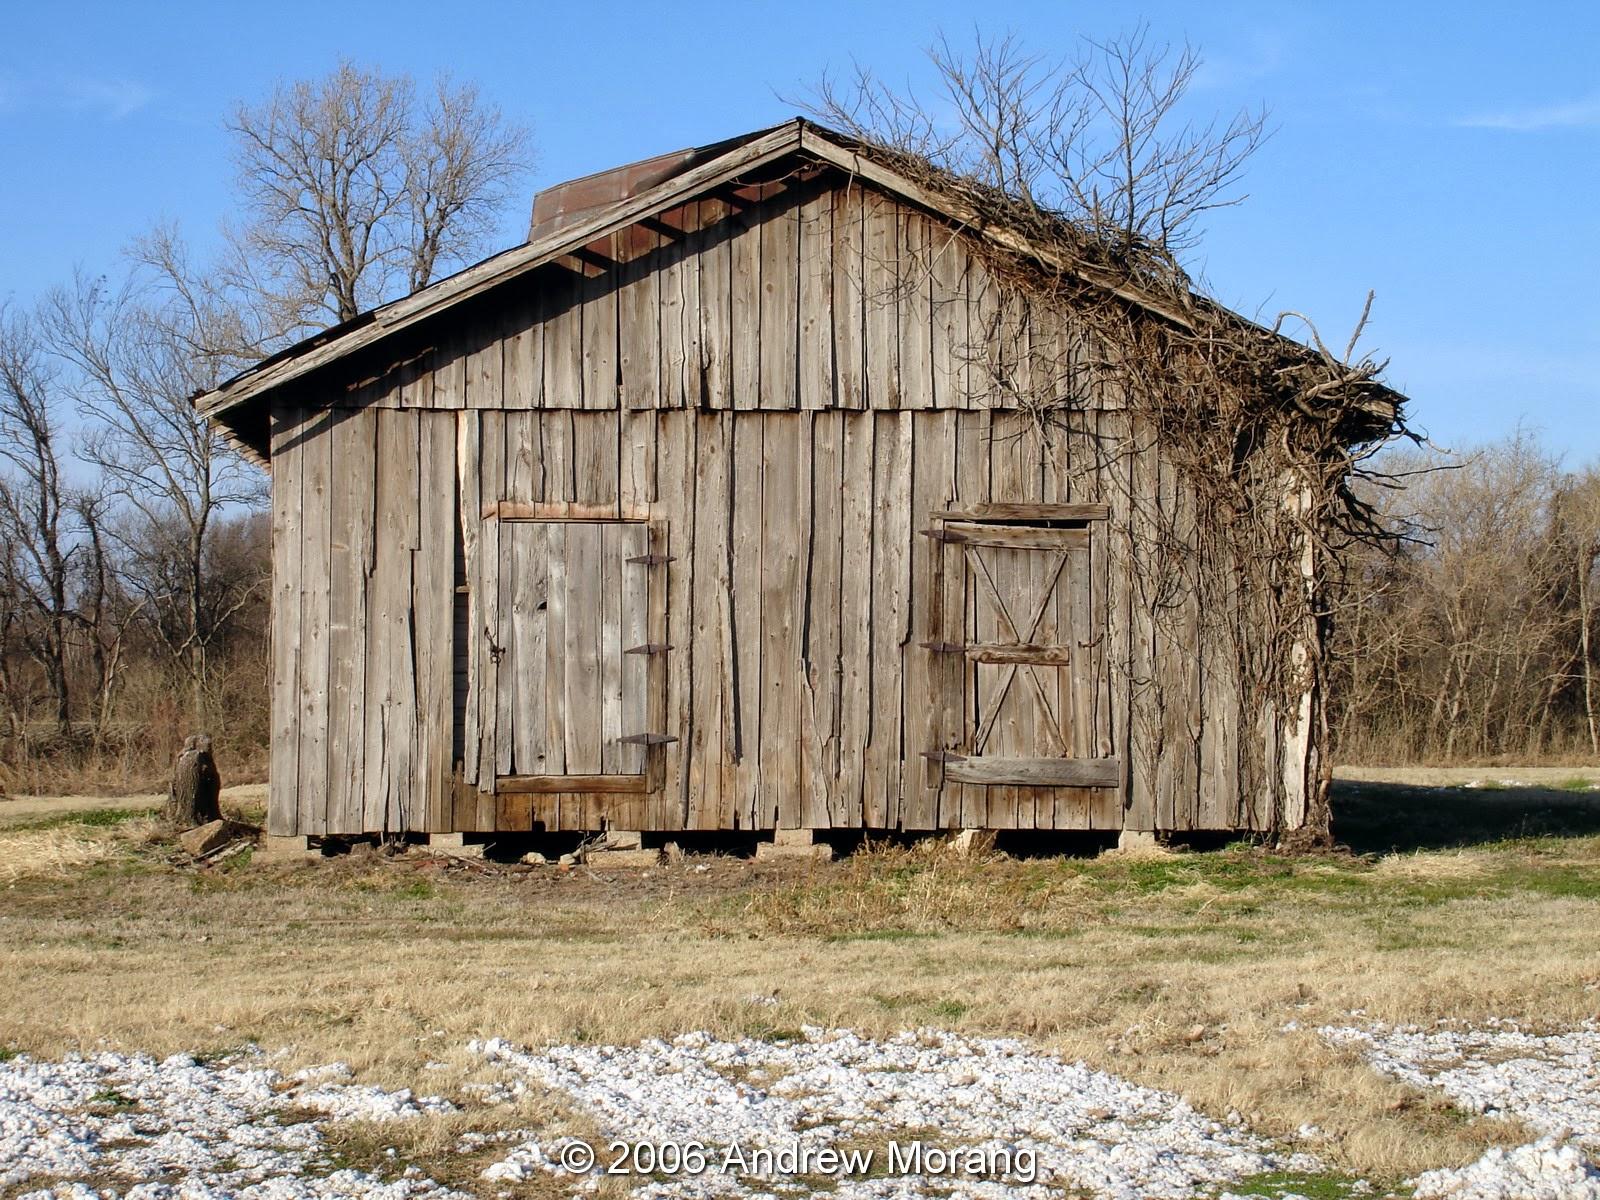 Mississippi washington county chatham - Cotton Fields Chatham Mississippi